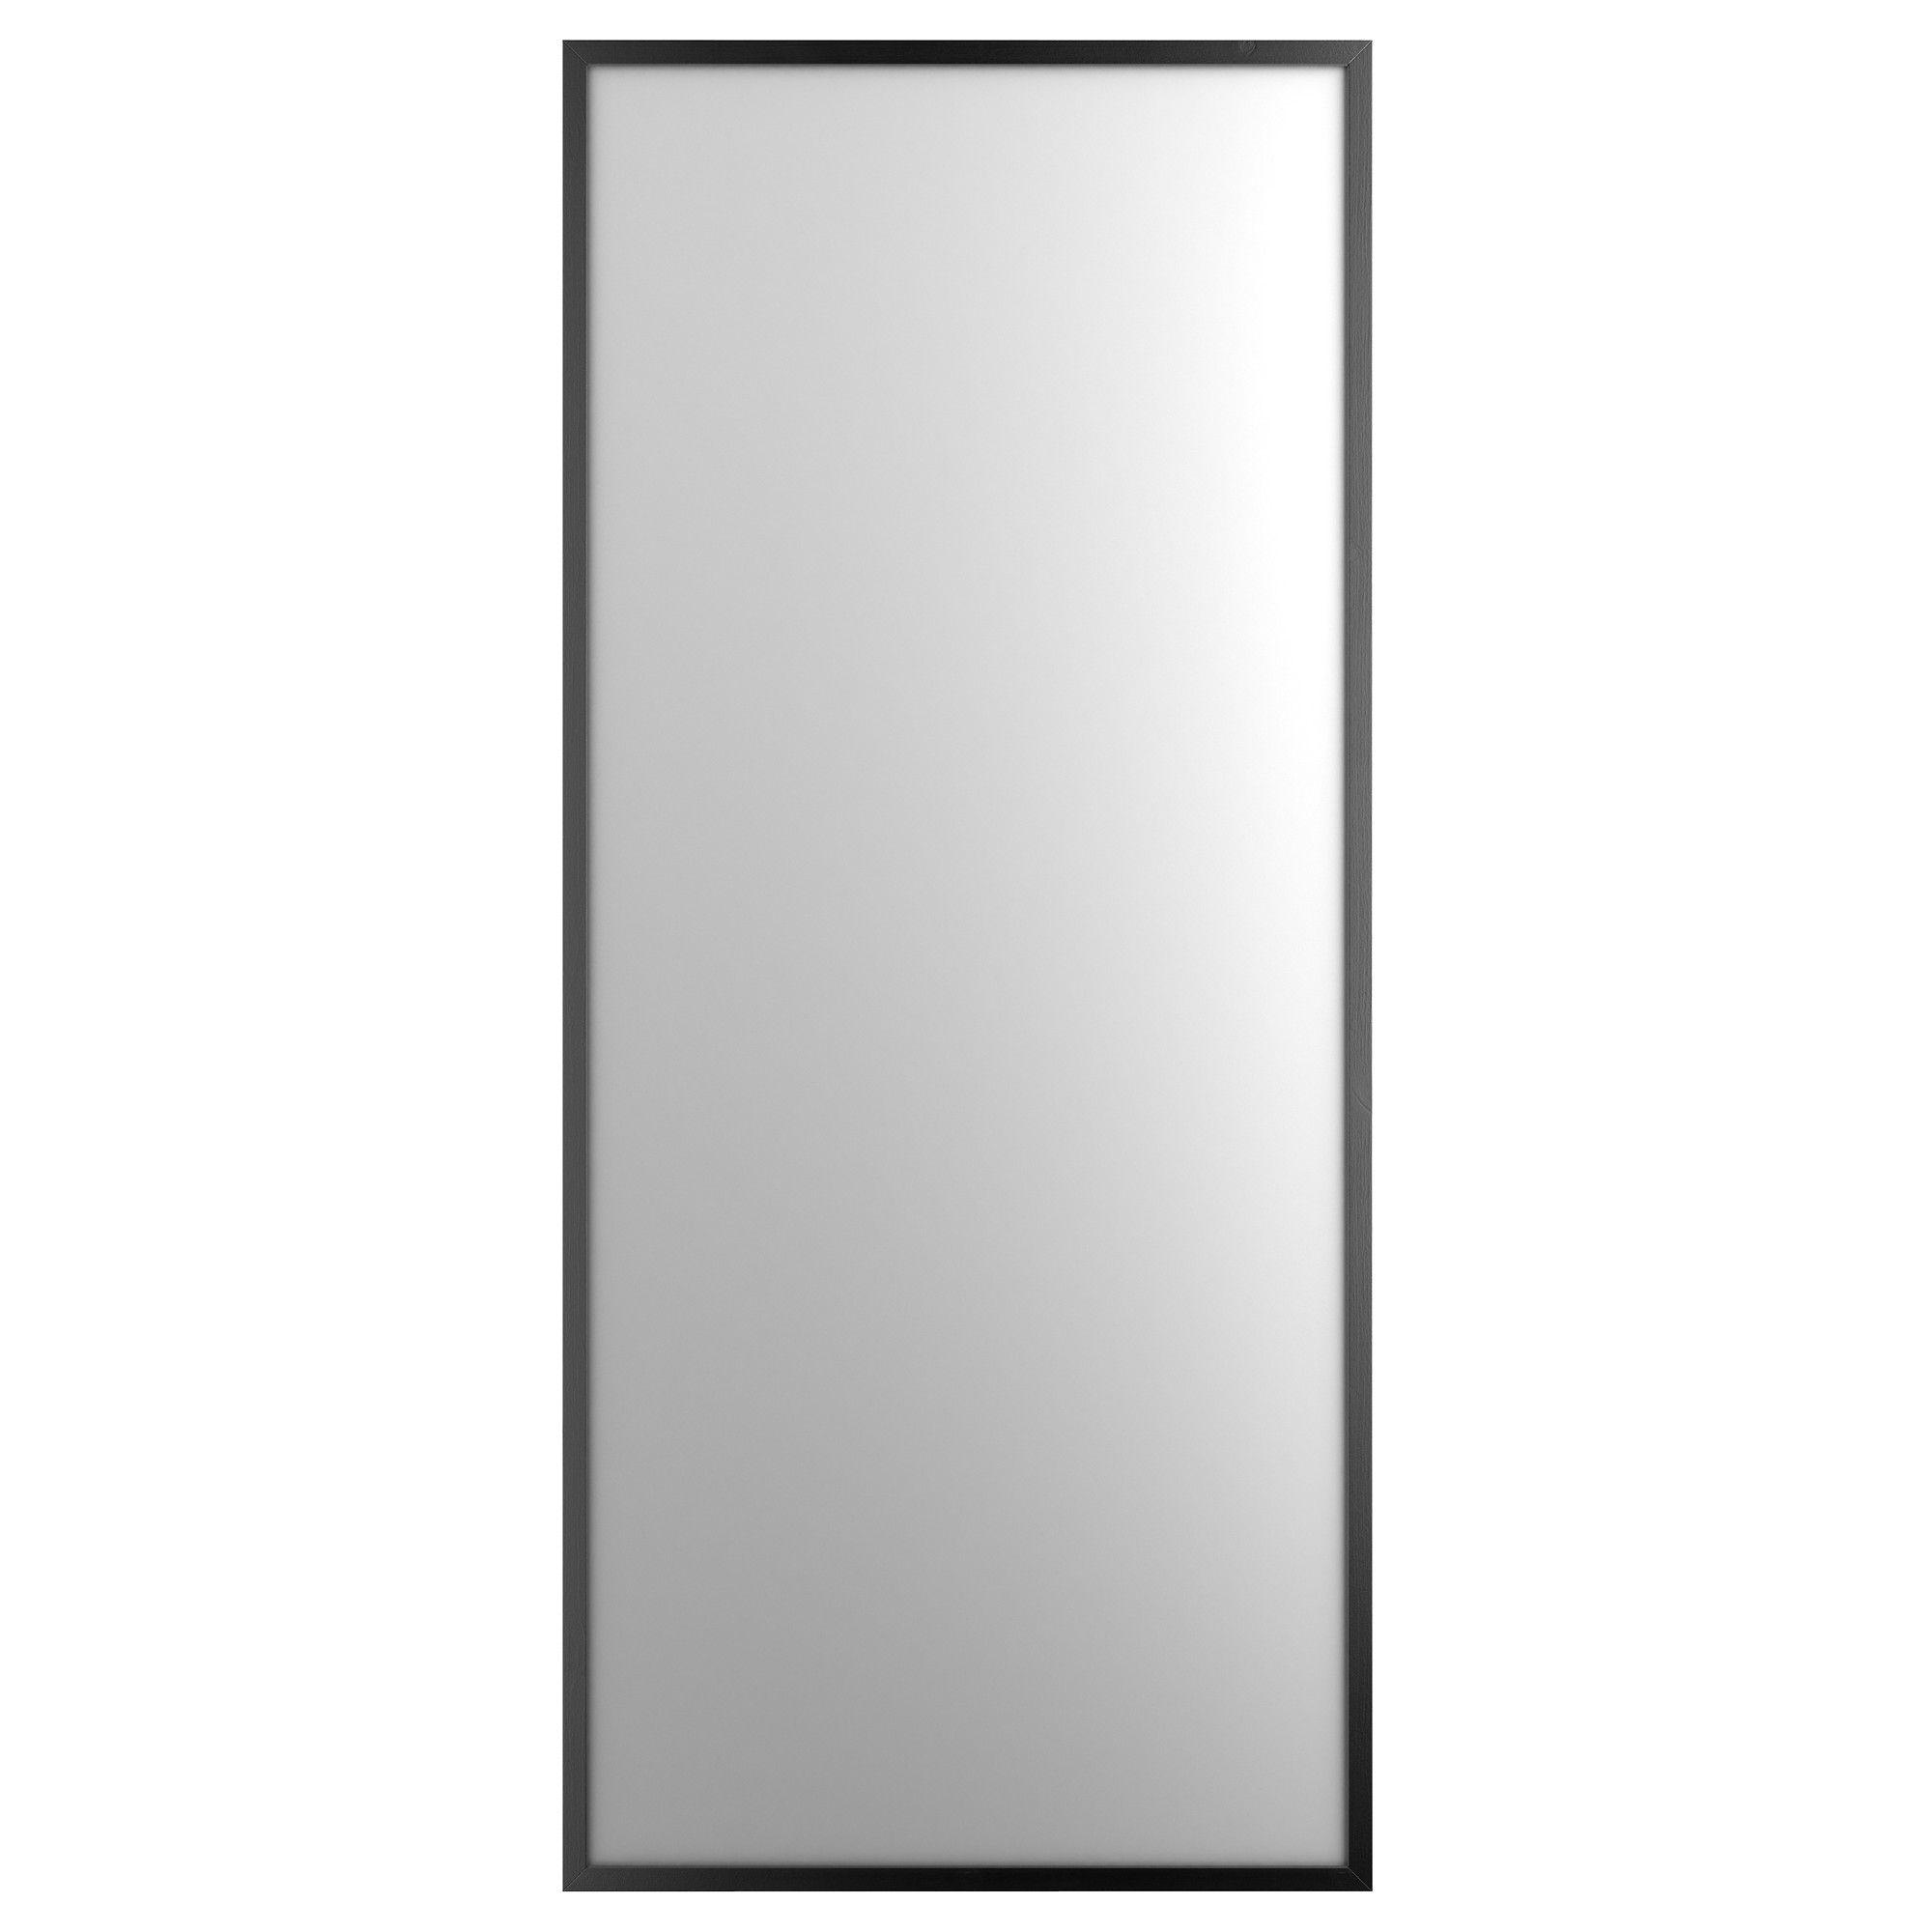 Ikea Us Furniture And Home Furnishings Stave Mirror Ikea Stave Mirror Black Bedroom Furniture